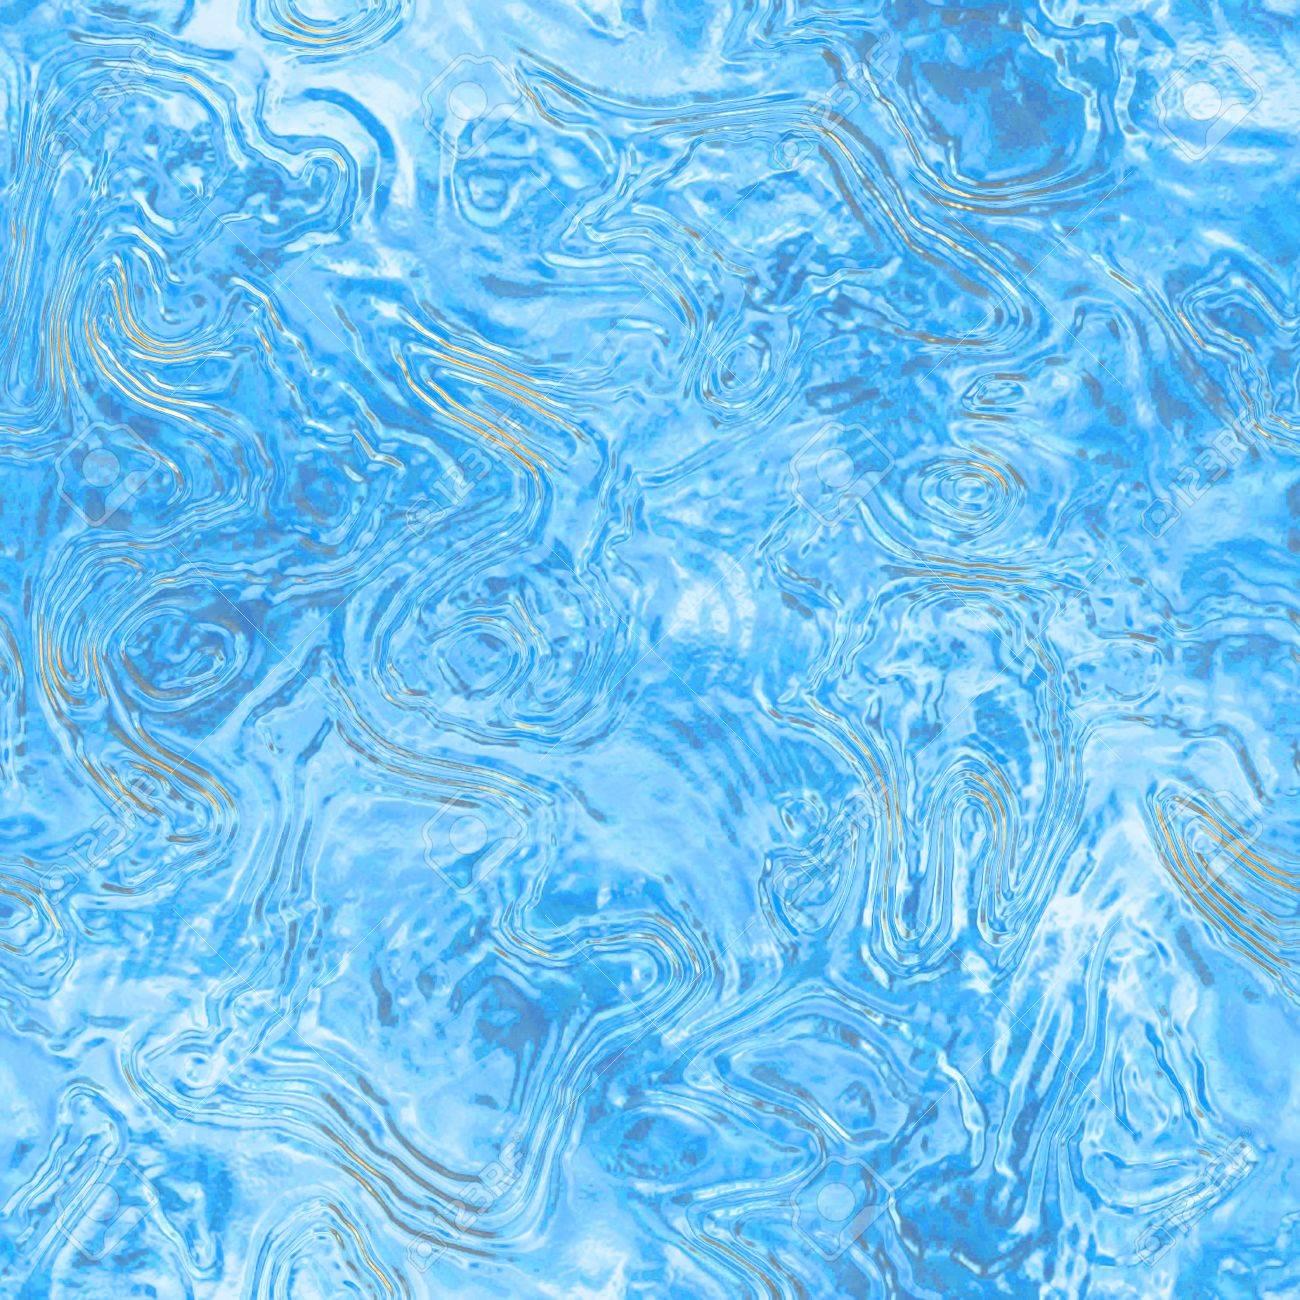 Seamless Water Texture